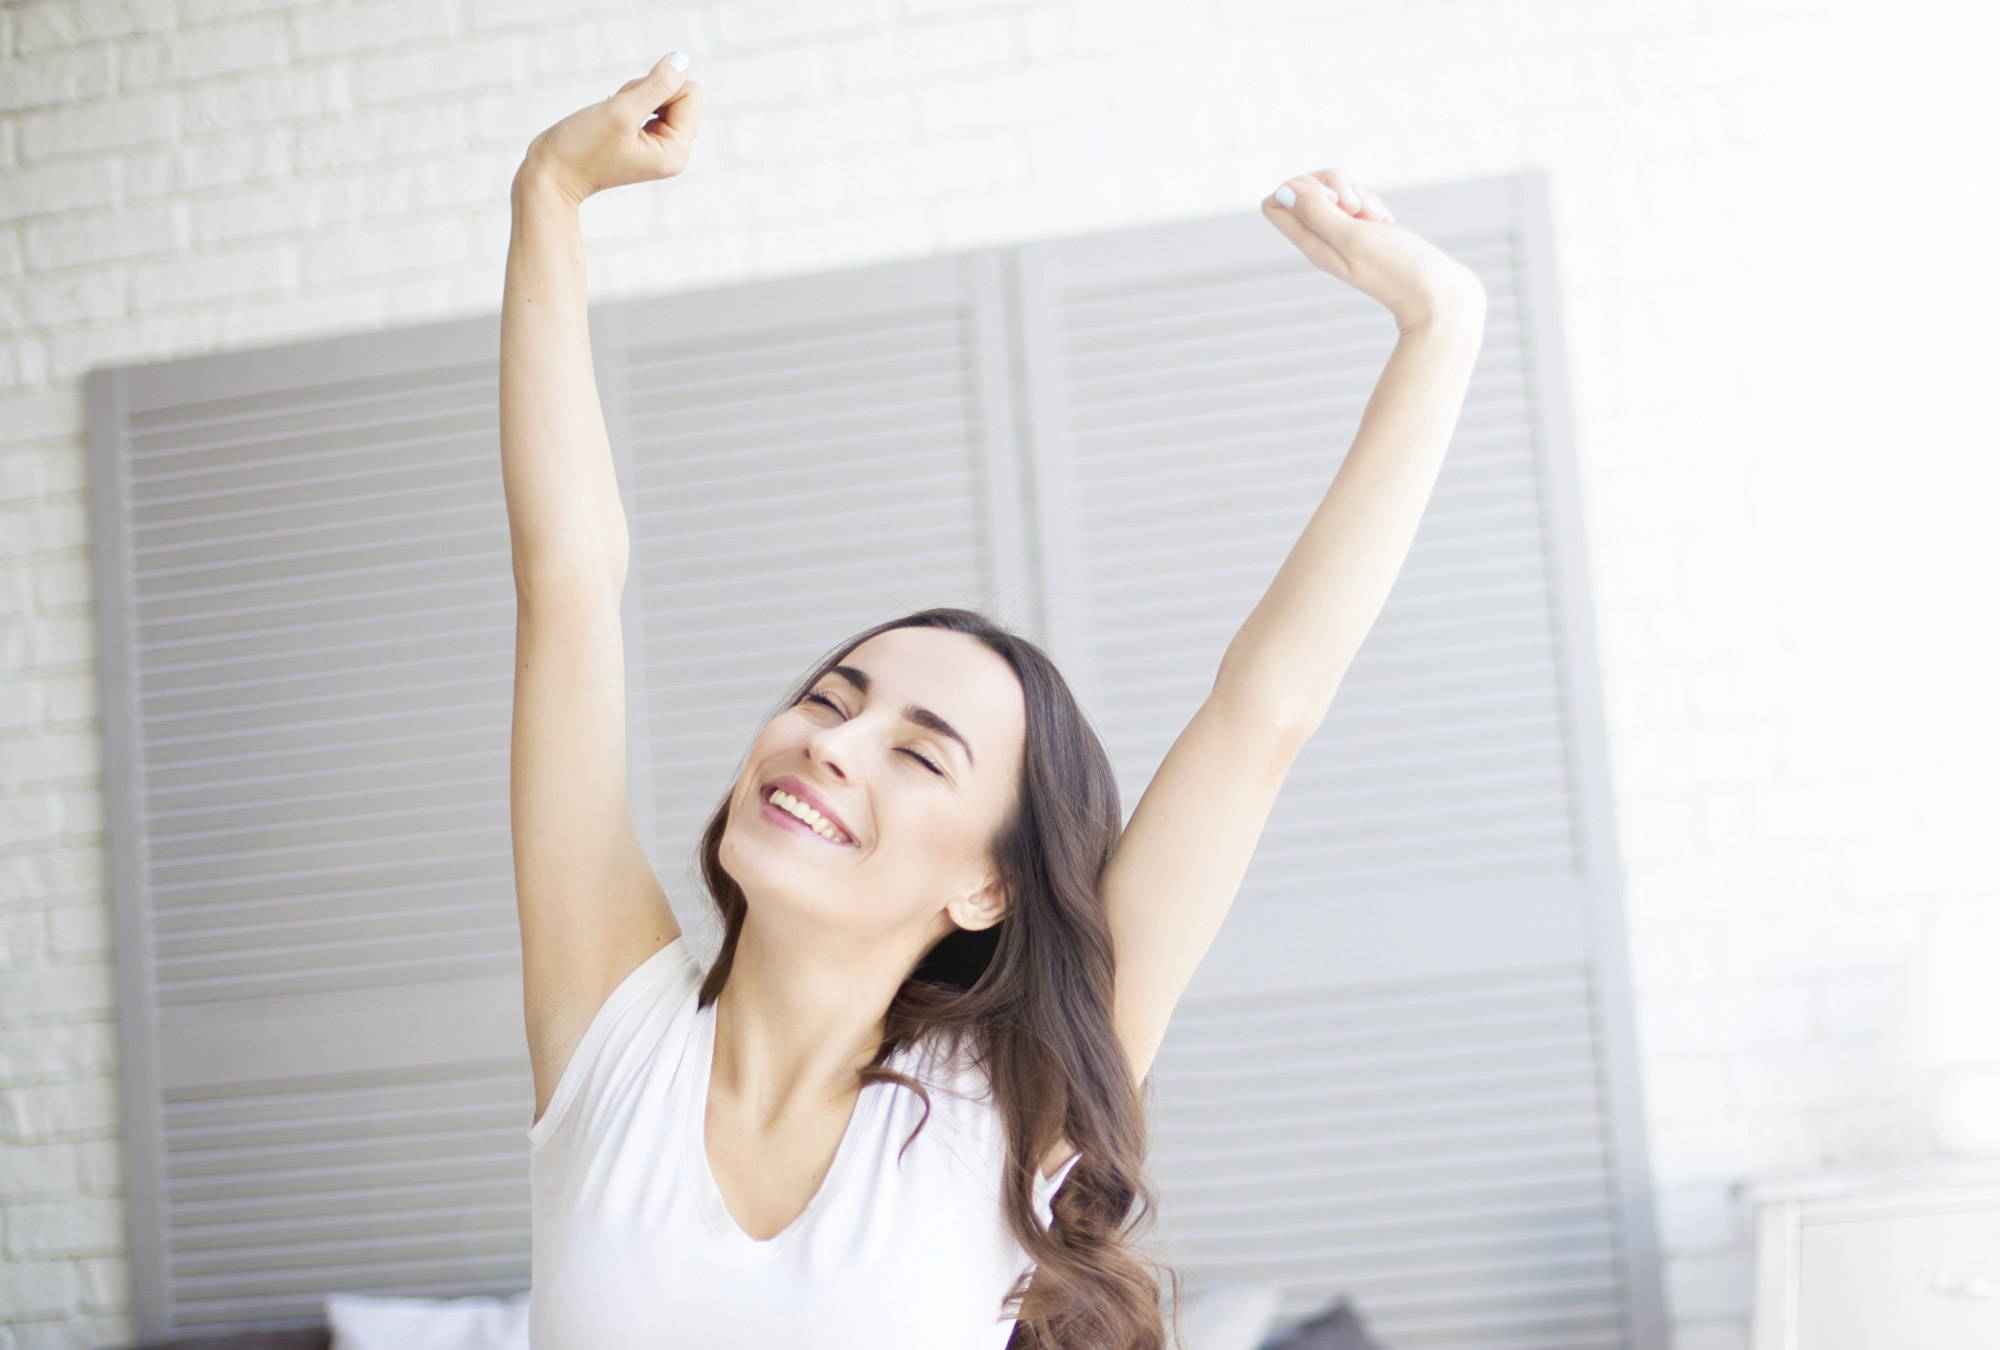 SLEEP ELEMENTS Supplement Aid Melatonin Naturally with Magnesium Zinc - THL Sleep